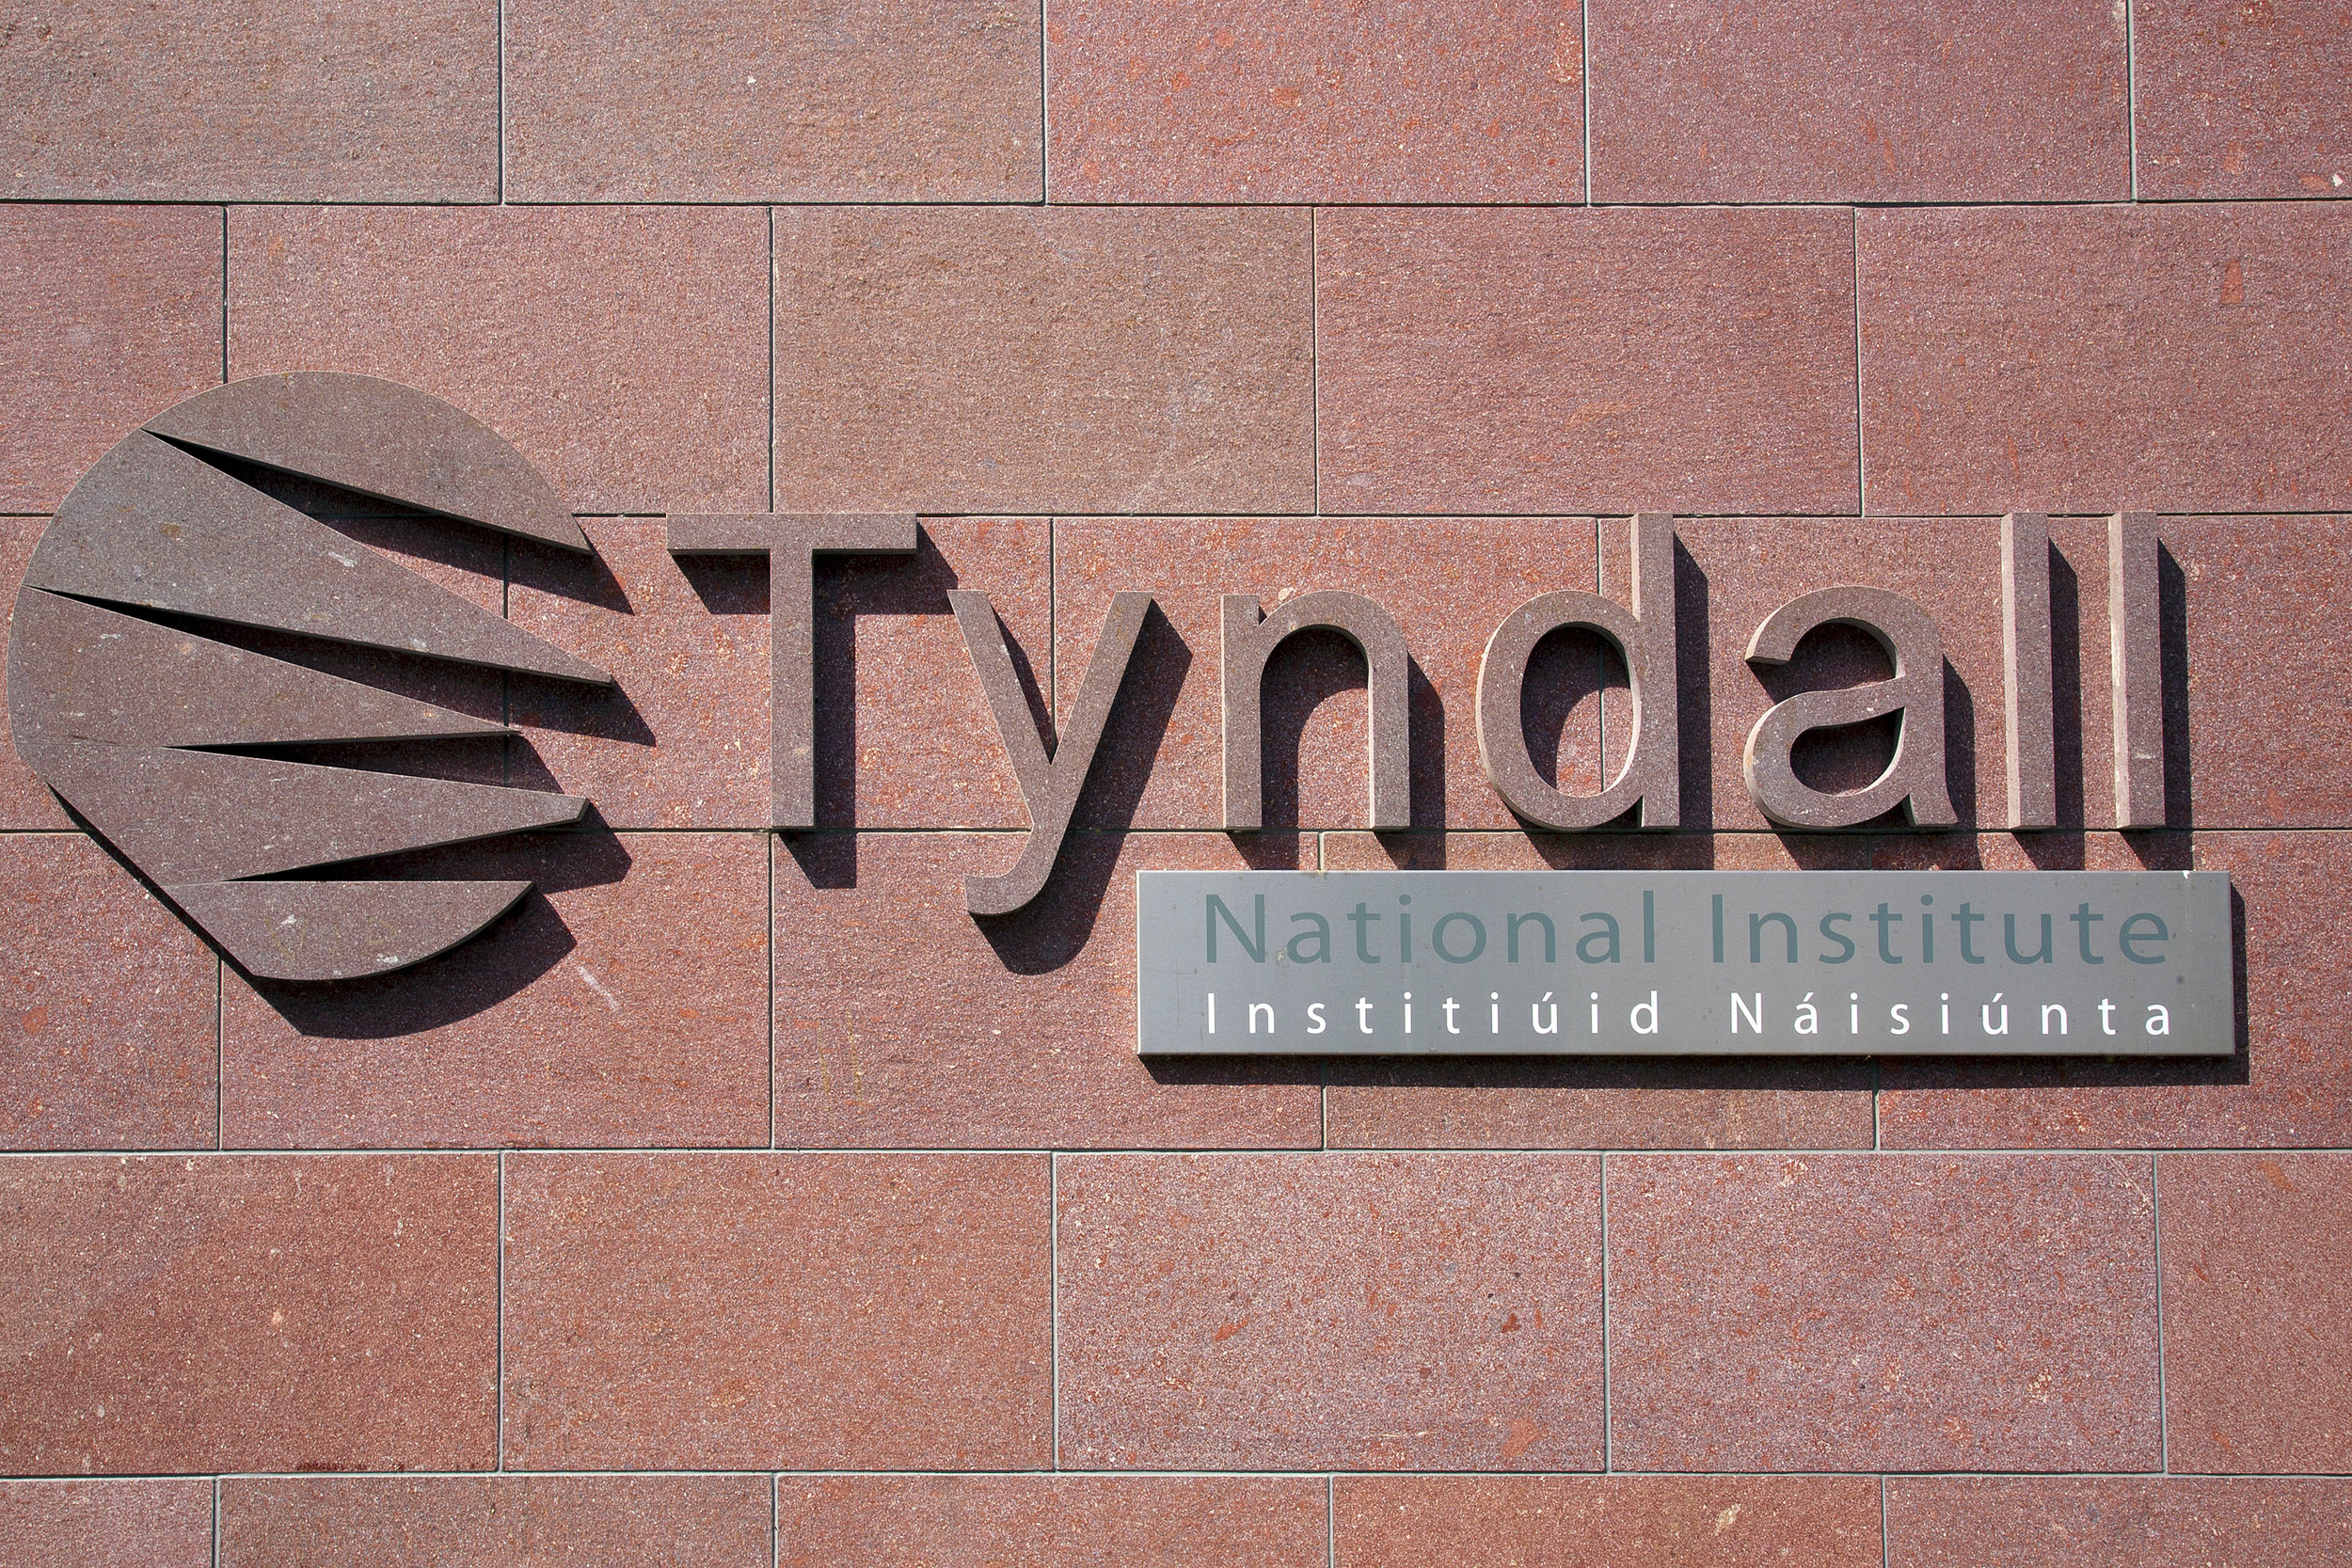 TYNDALL_0246.jpg